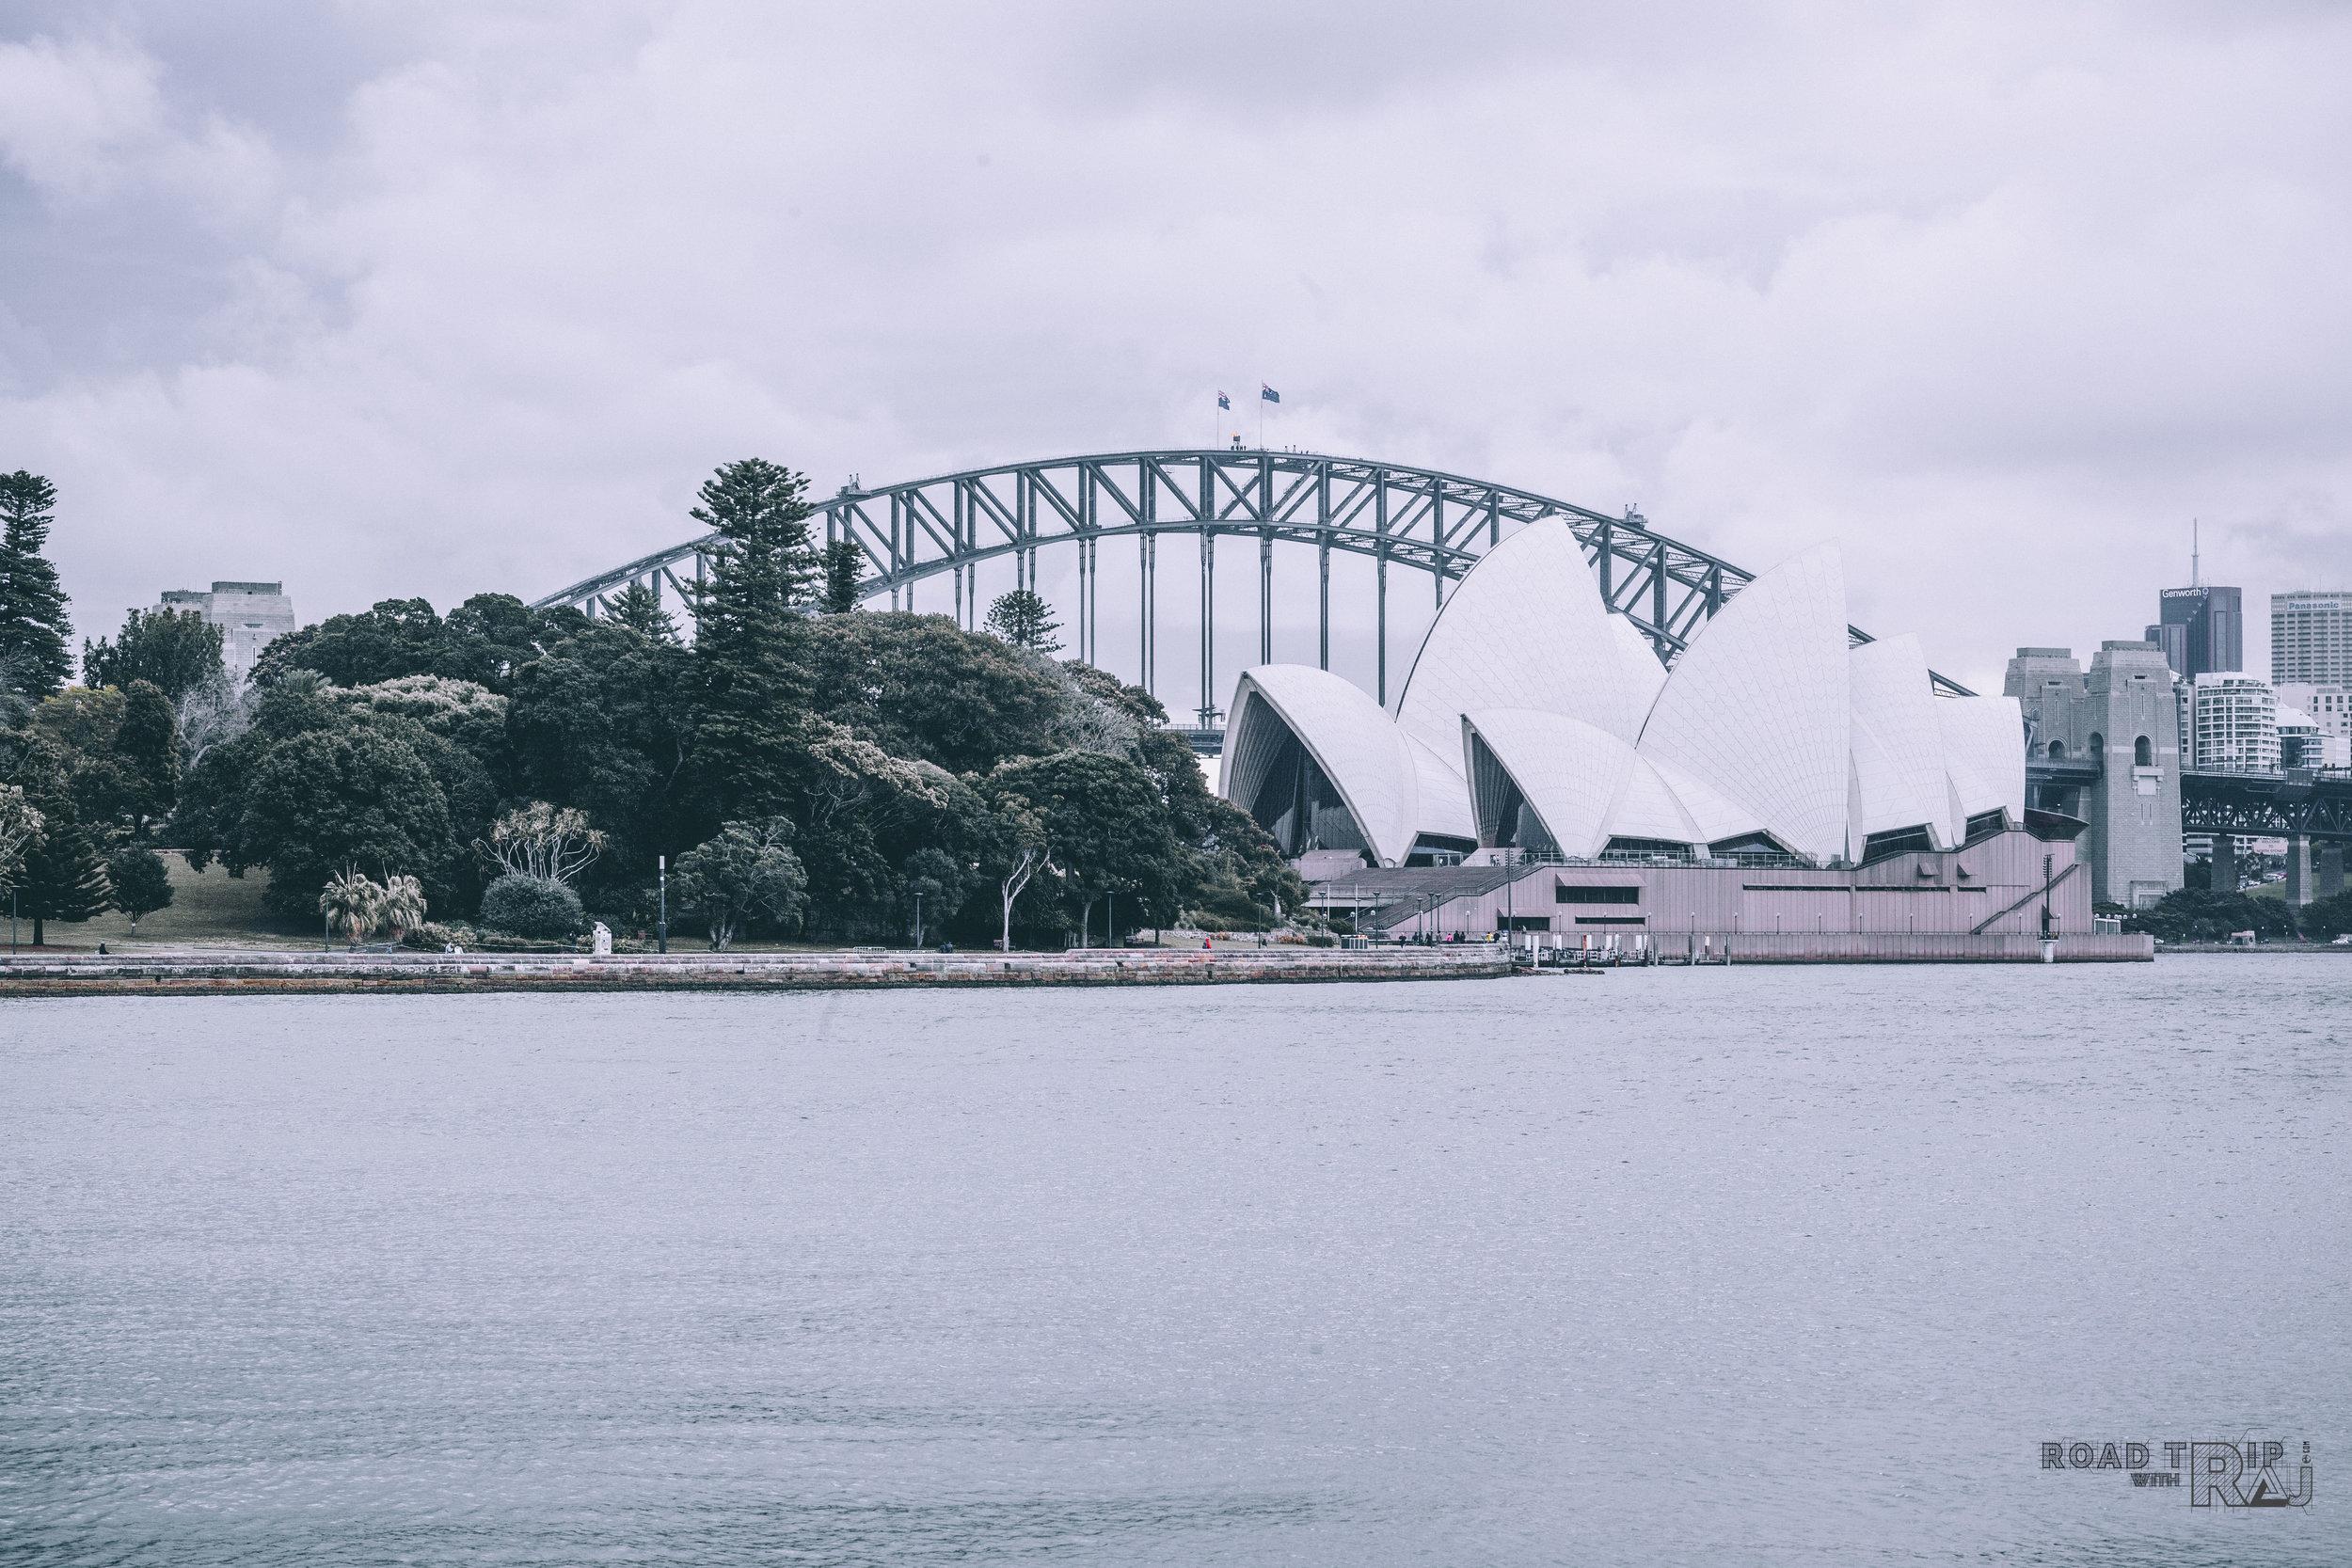 view-toward-the-sydney-opera-house.jpg